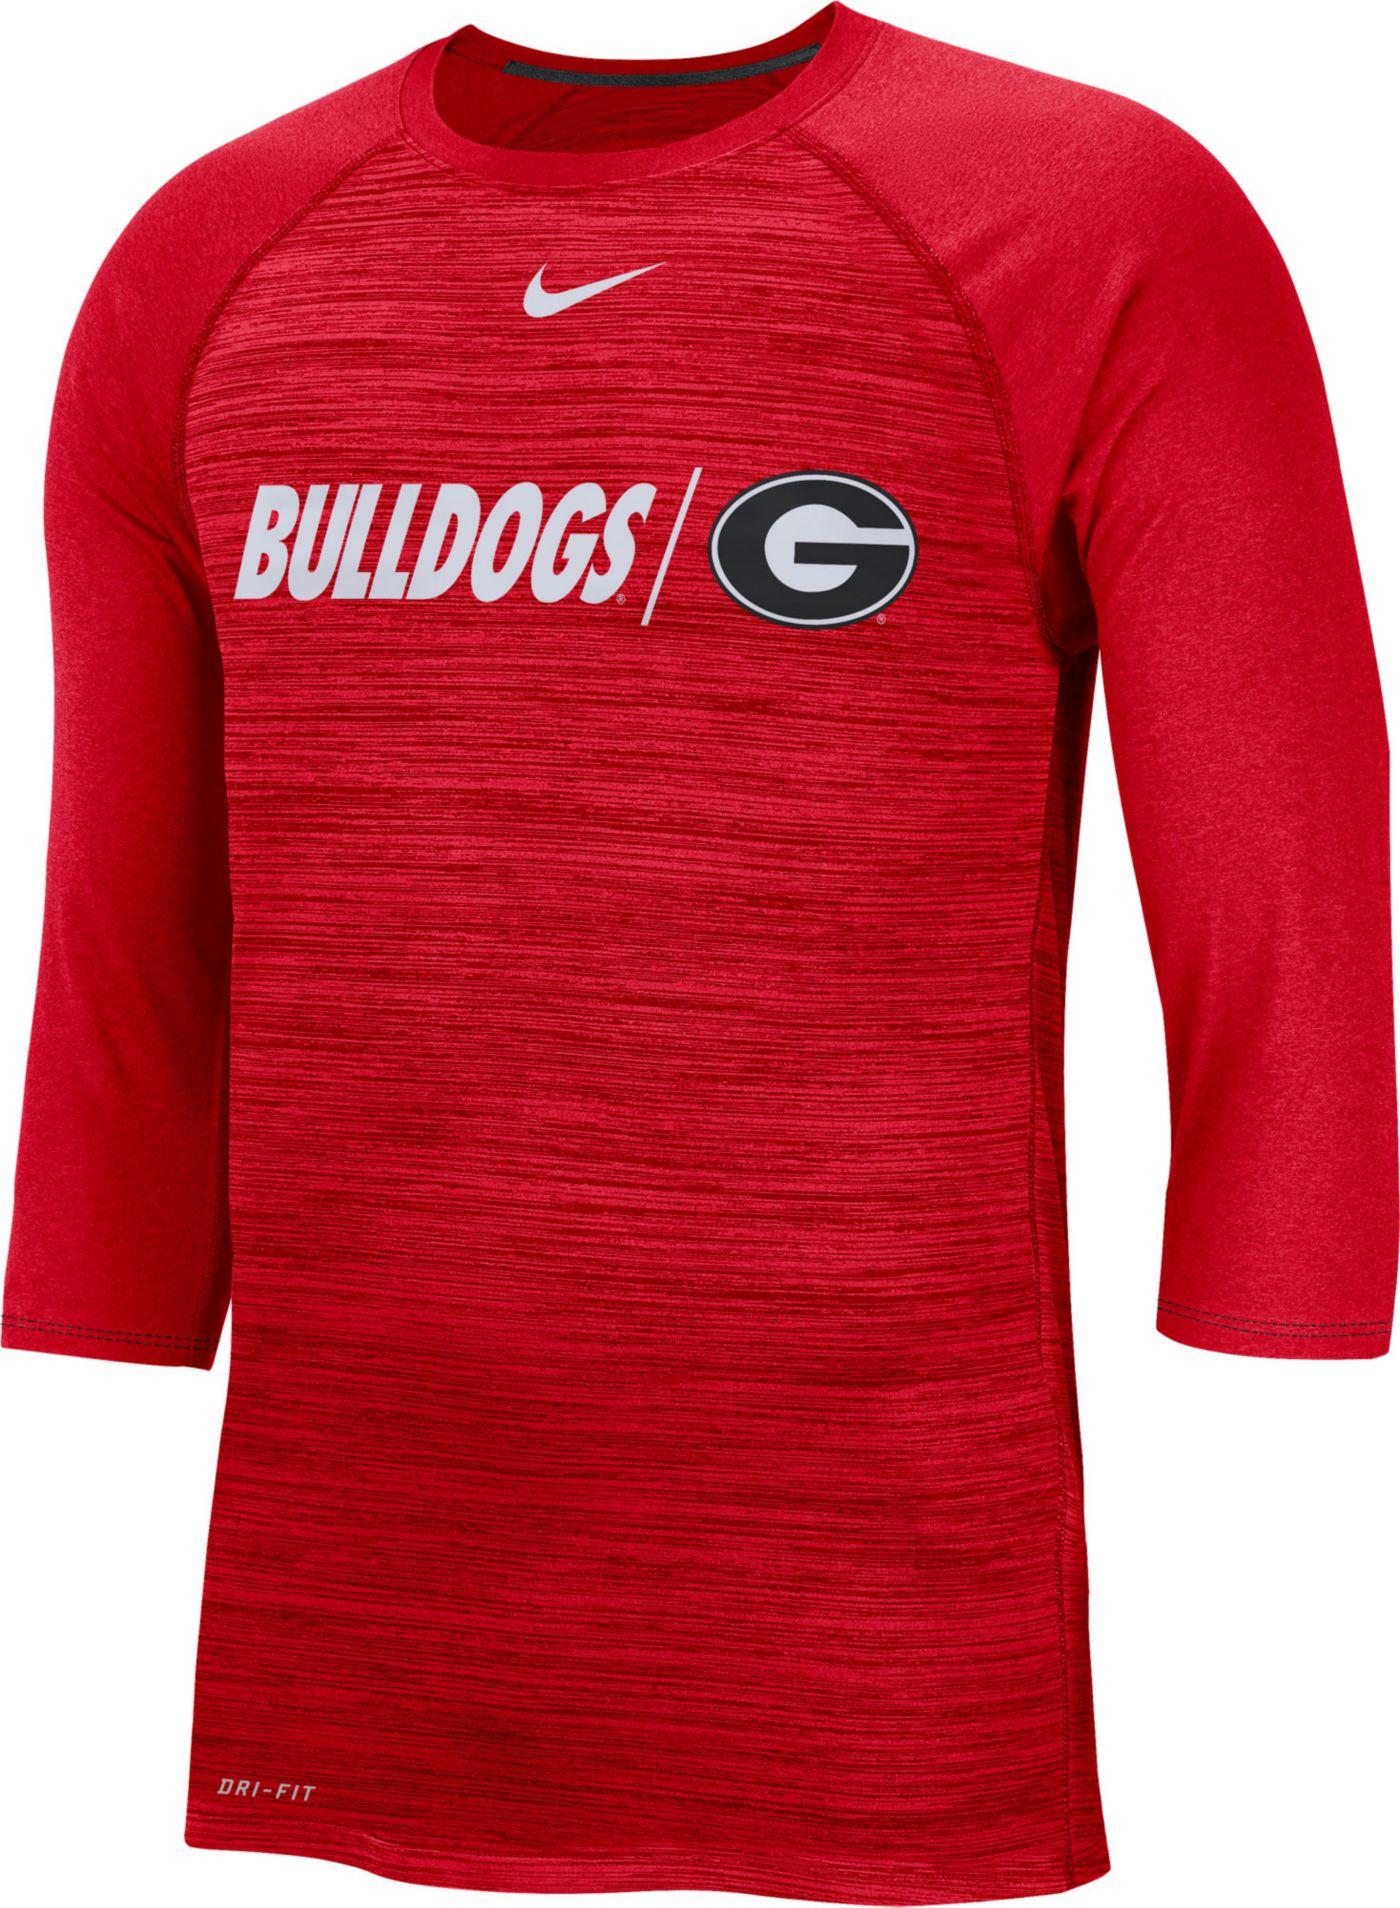 Nike Men's Georgia Bulldogs Red Dry Legend 3/4 Sleeve T-Shirt